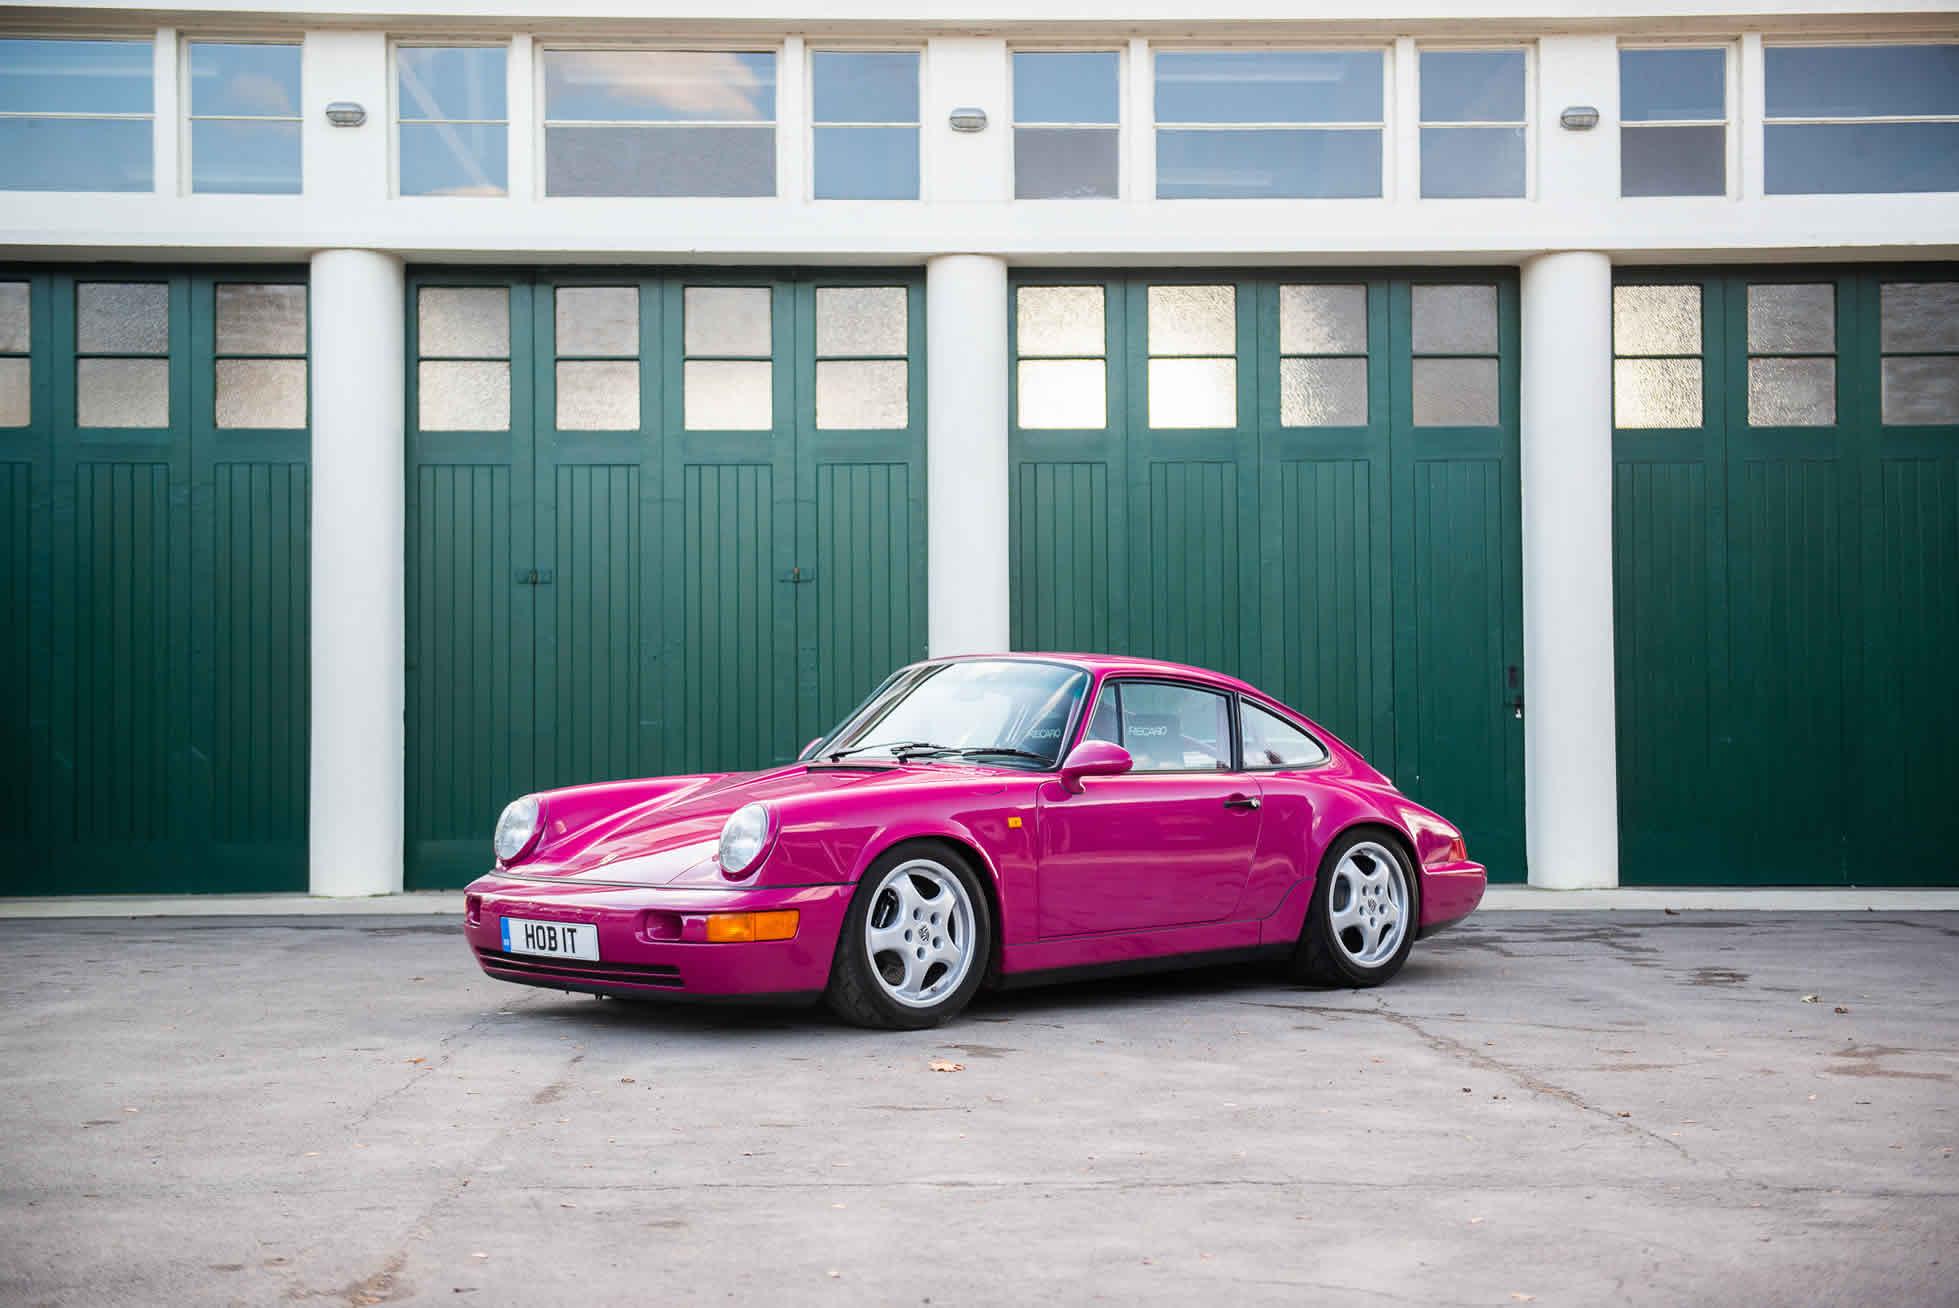 Porsche 964 Carrera RS Clubsport side profile